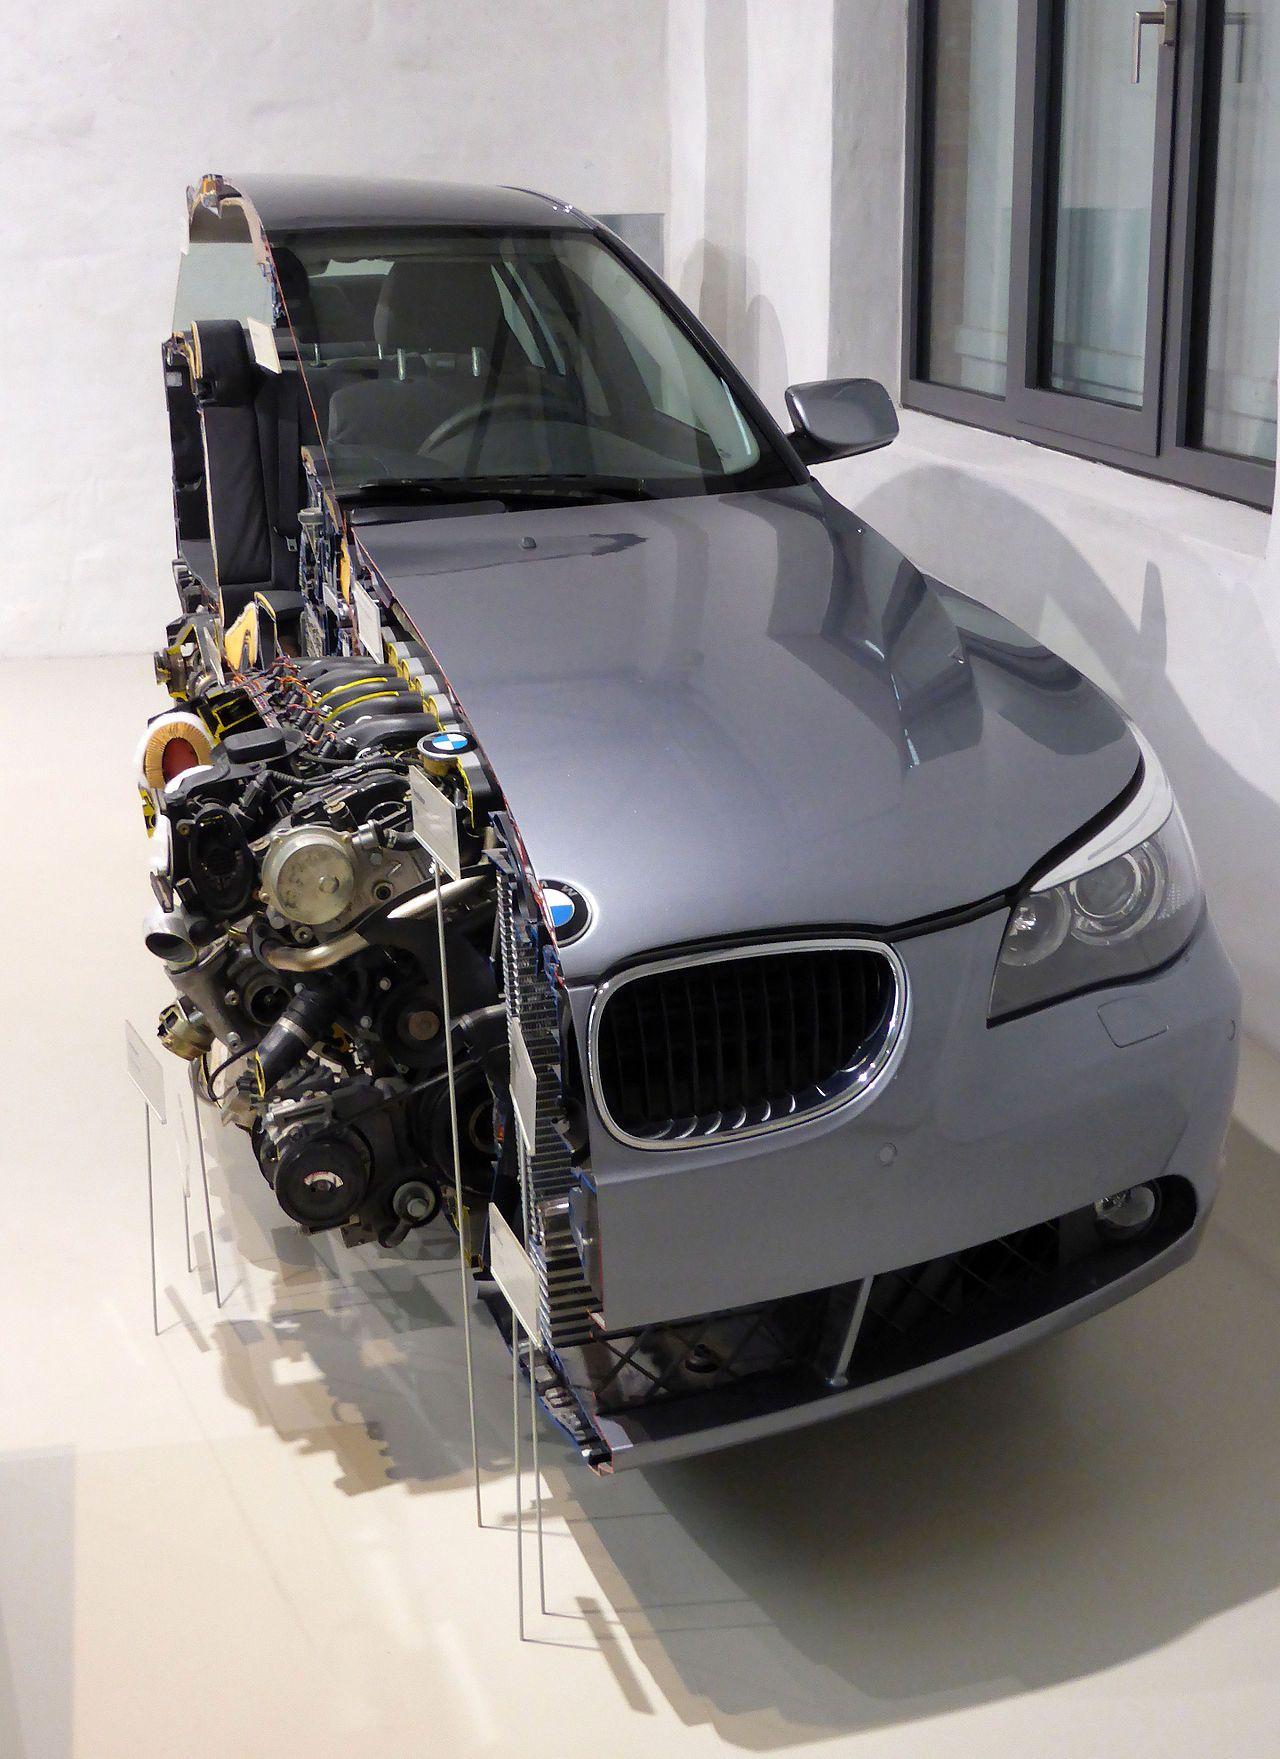 BMW 530d (E60) Schnittmodell (02) - BMW 5 Series (E60) - Wikipedia